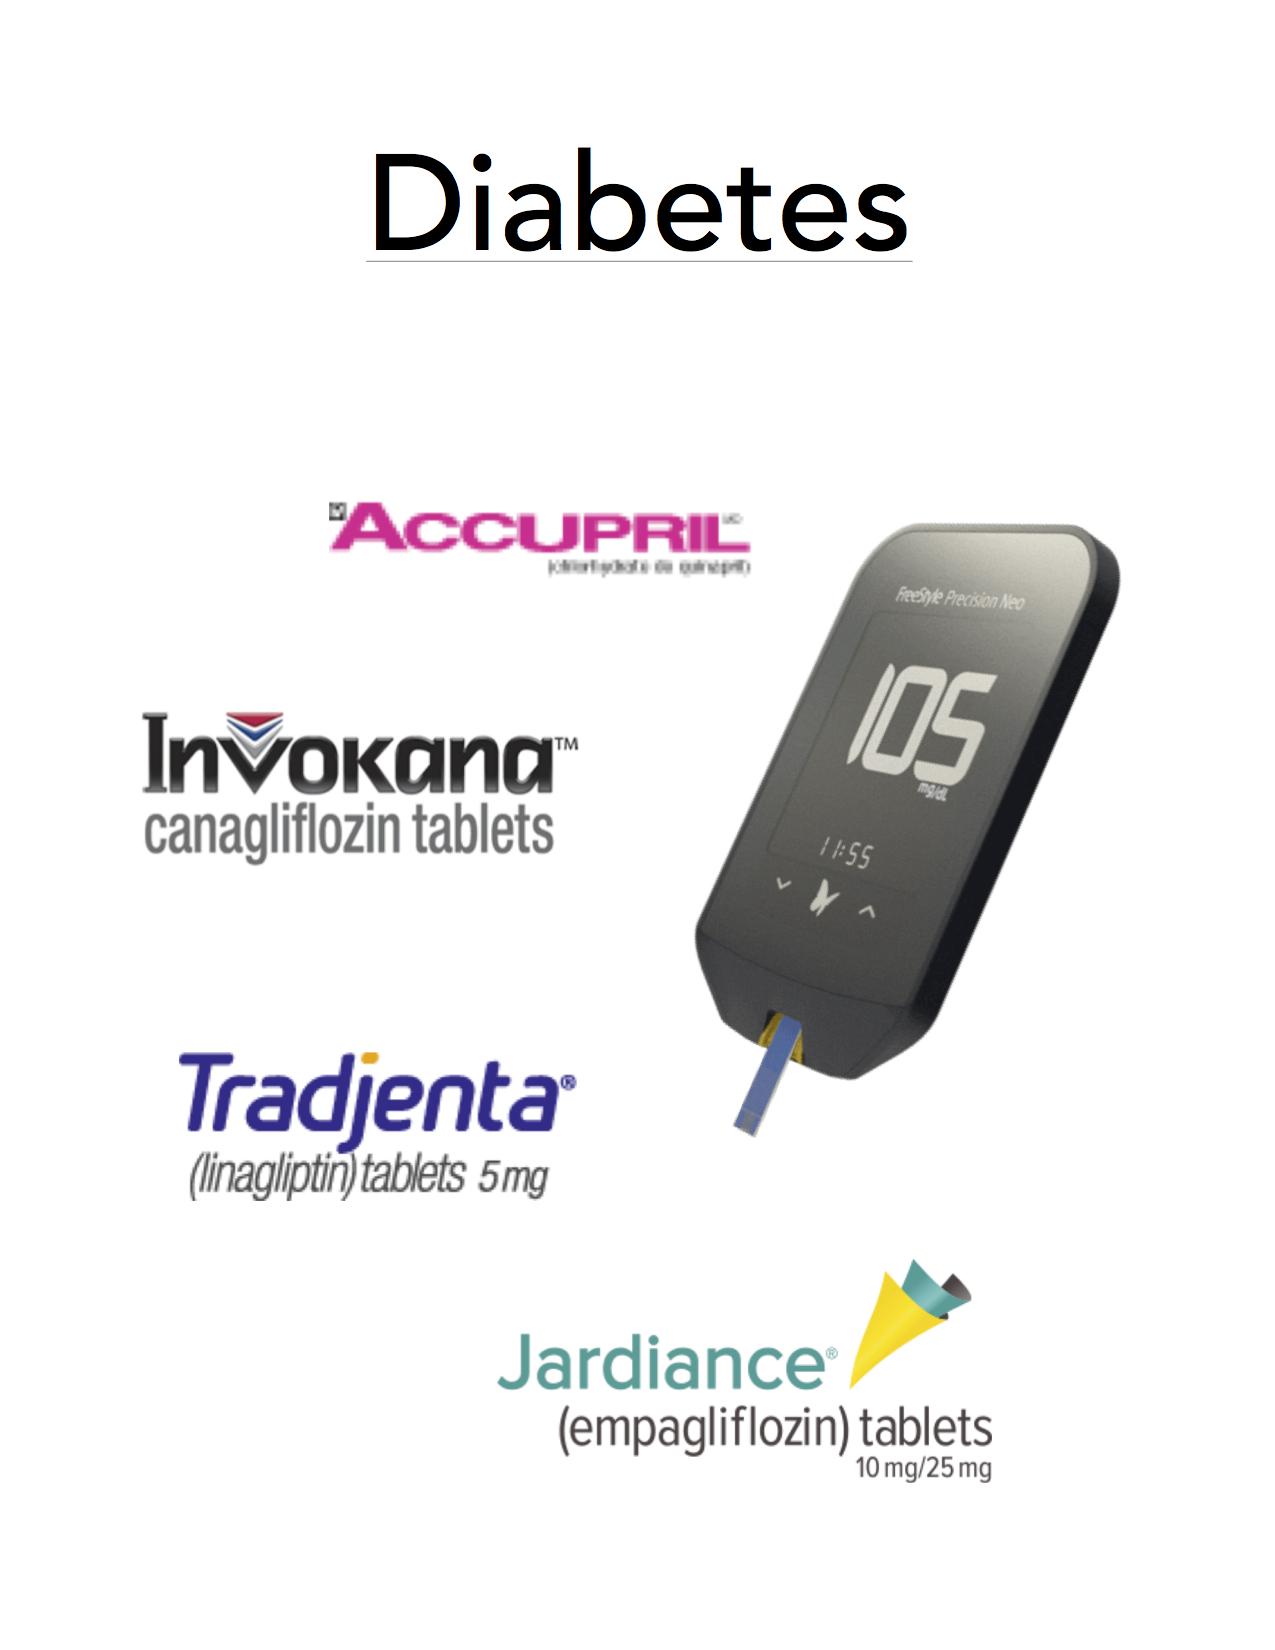 Diabetes - cream background PDF jPEG.jpg